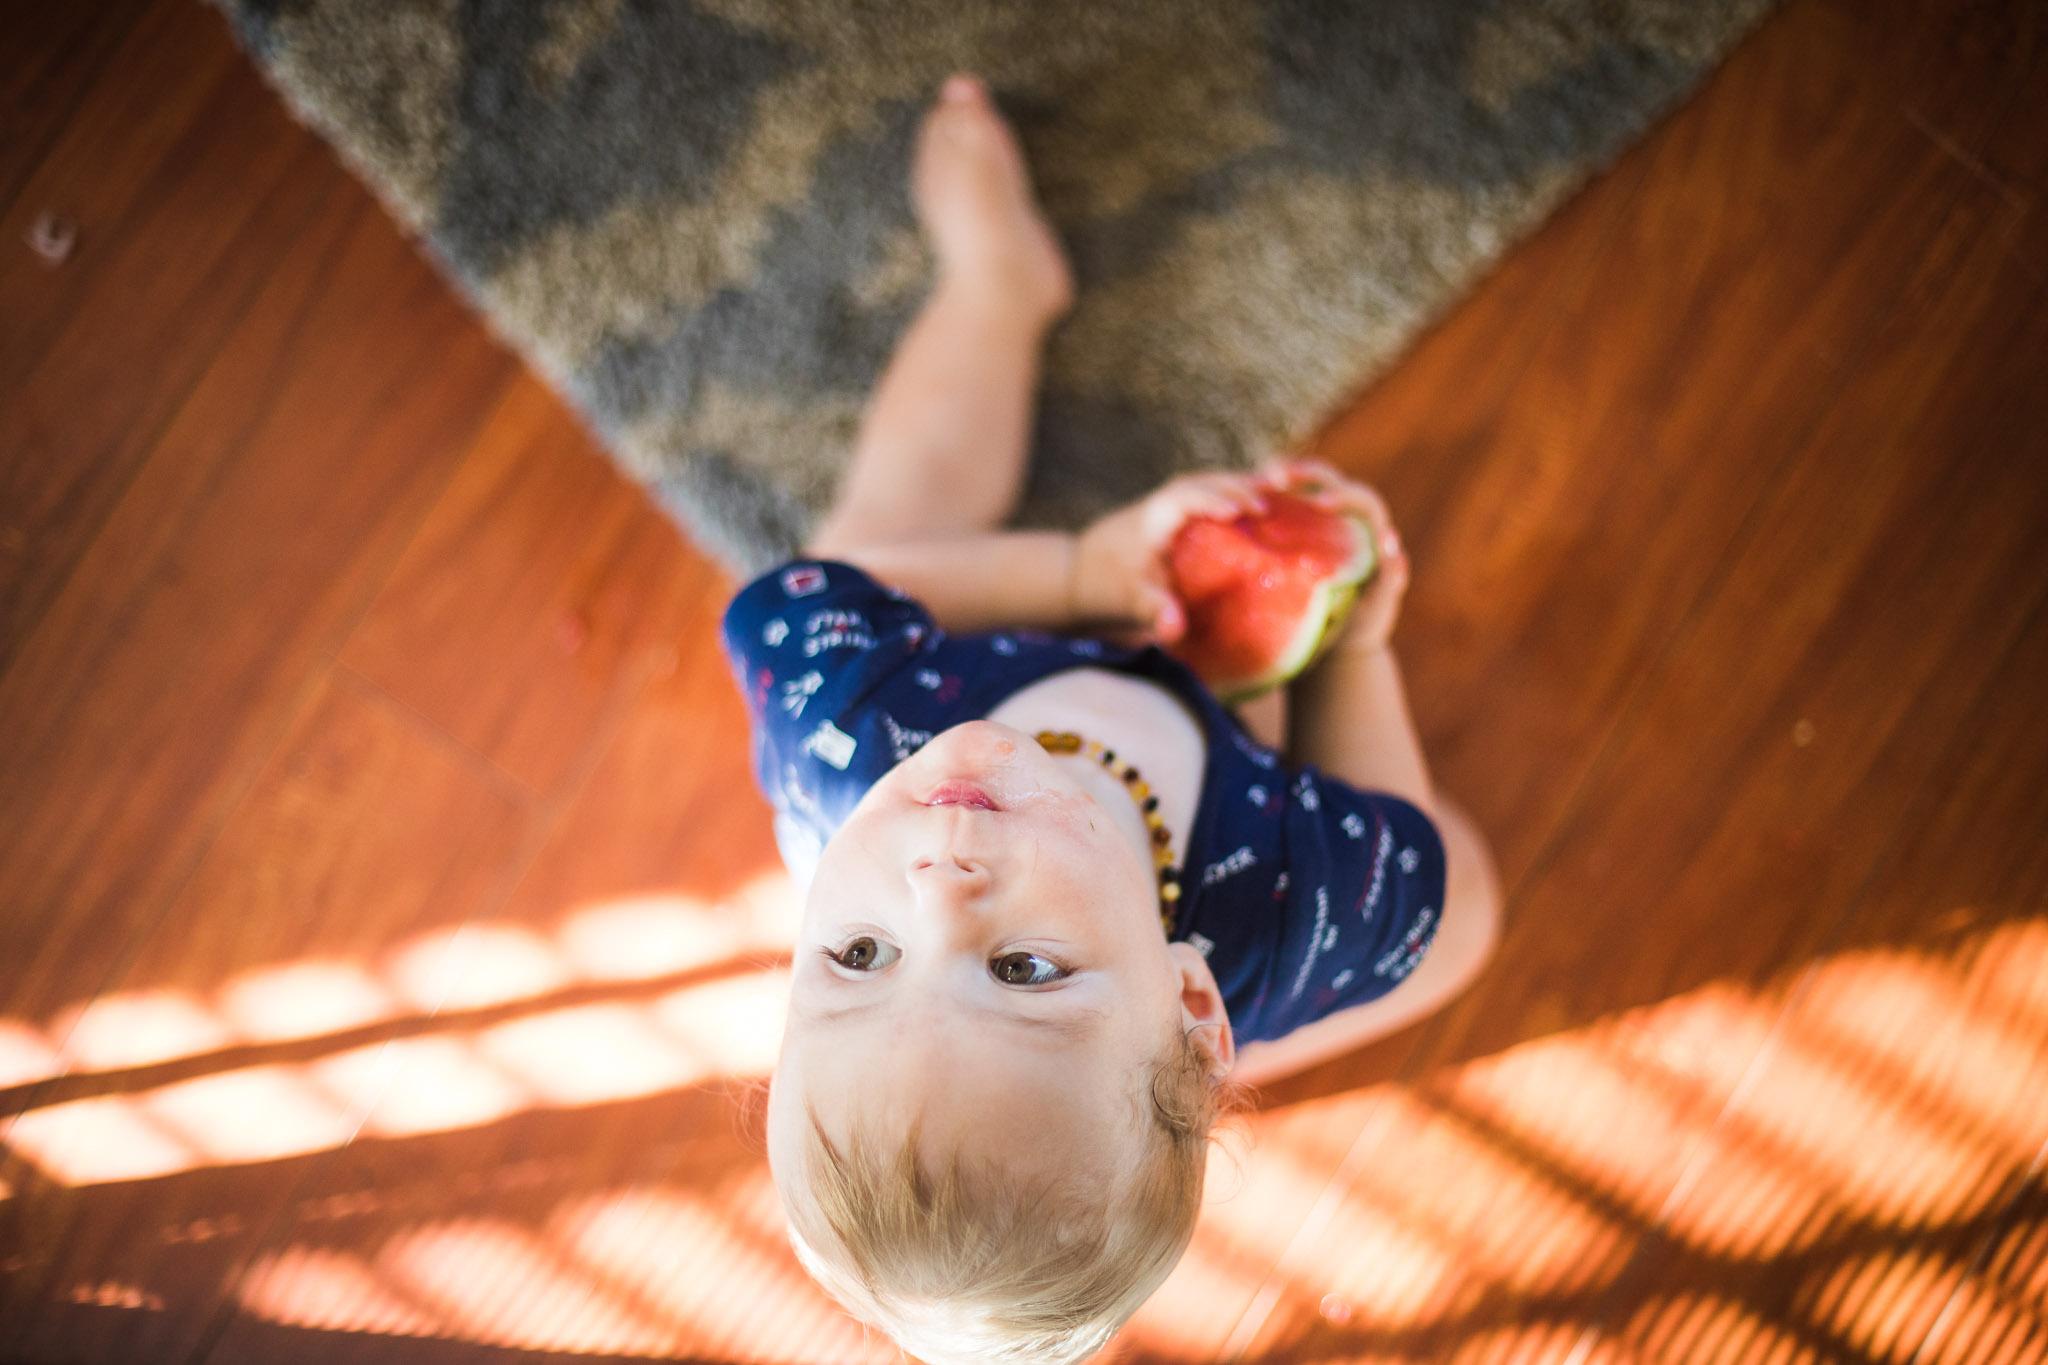 Archer_Inspired_Photography_Watermelon_Baby_Boy_Eating_Lifestyle_Photographer_California-37.jpg